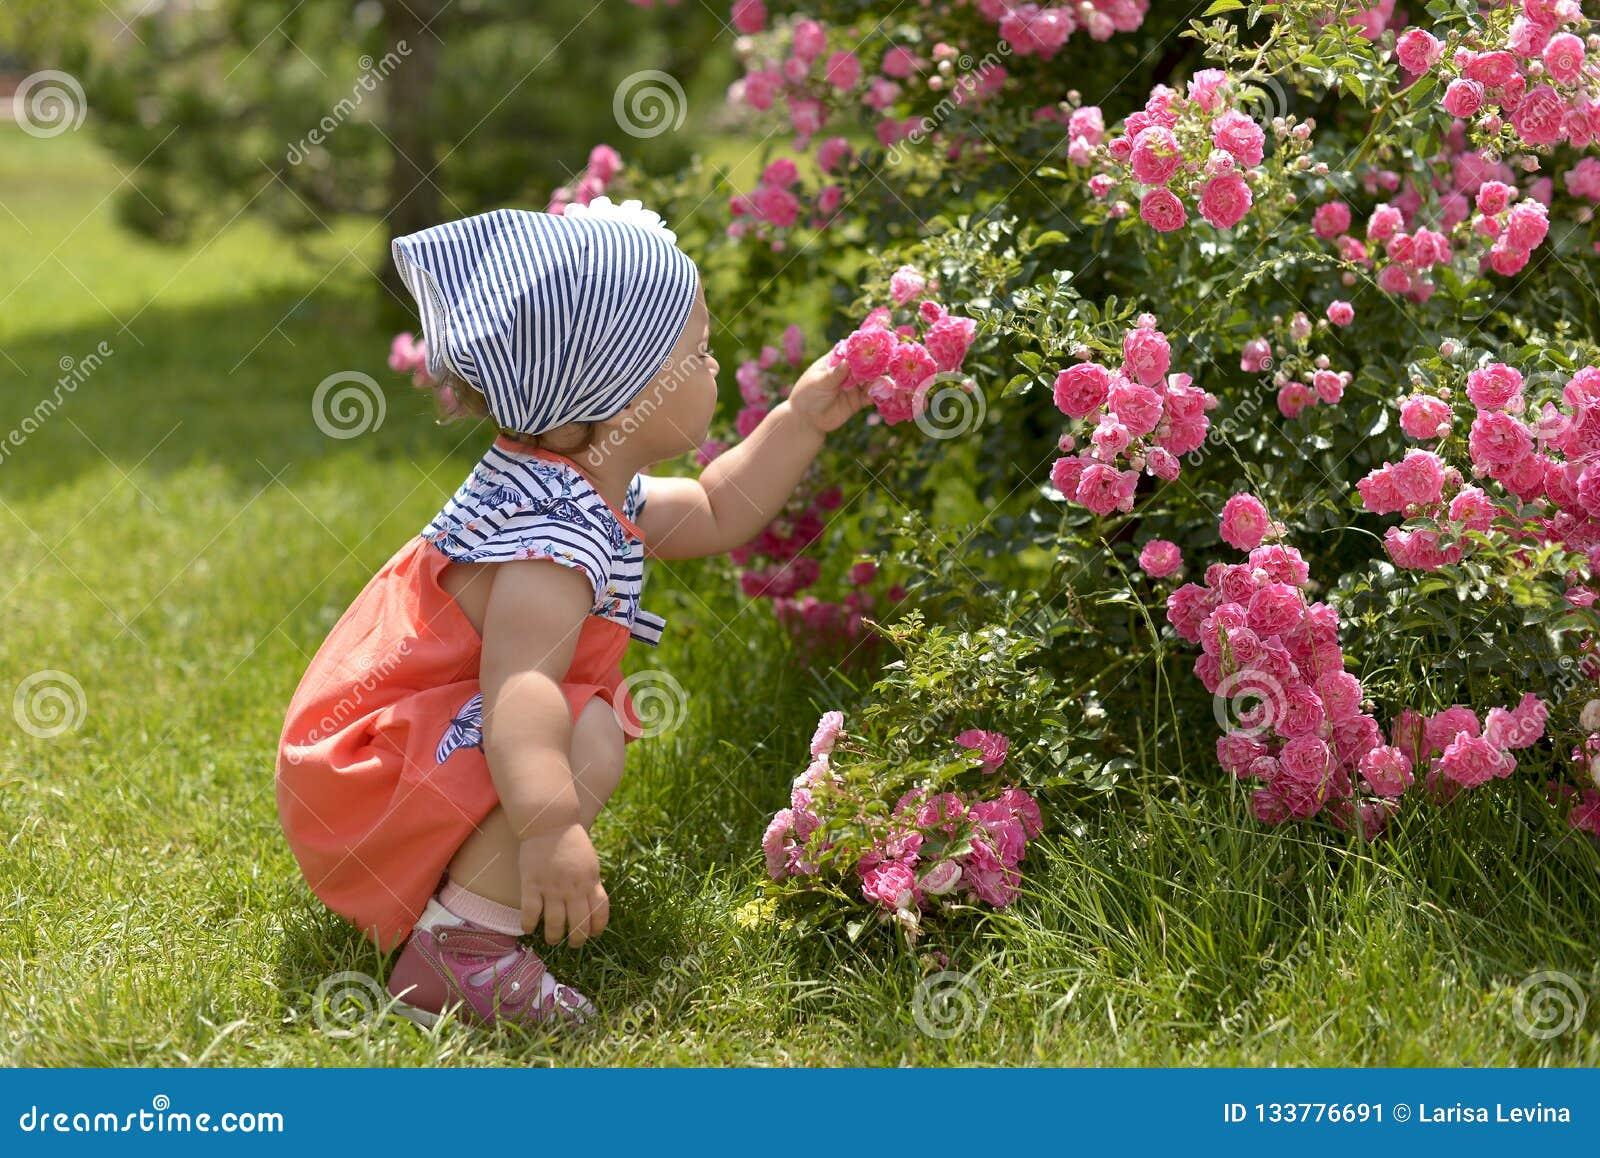 Menina no passeio no jardim, aspirando rosas cor-de-rosa